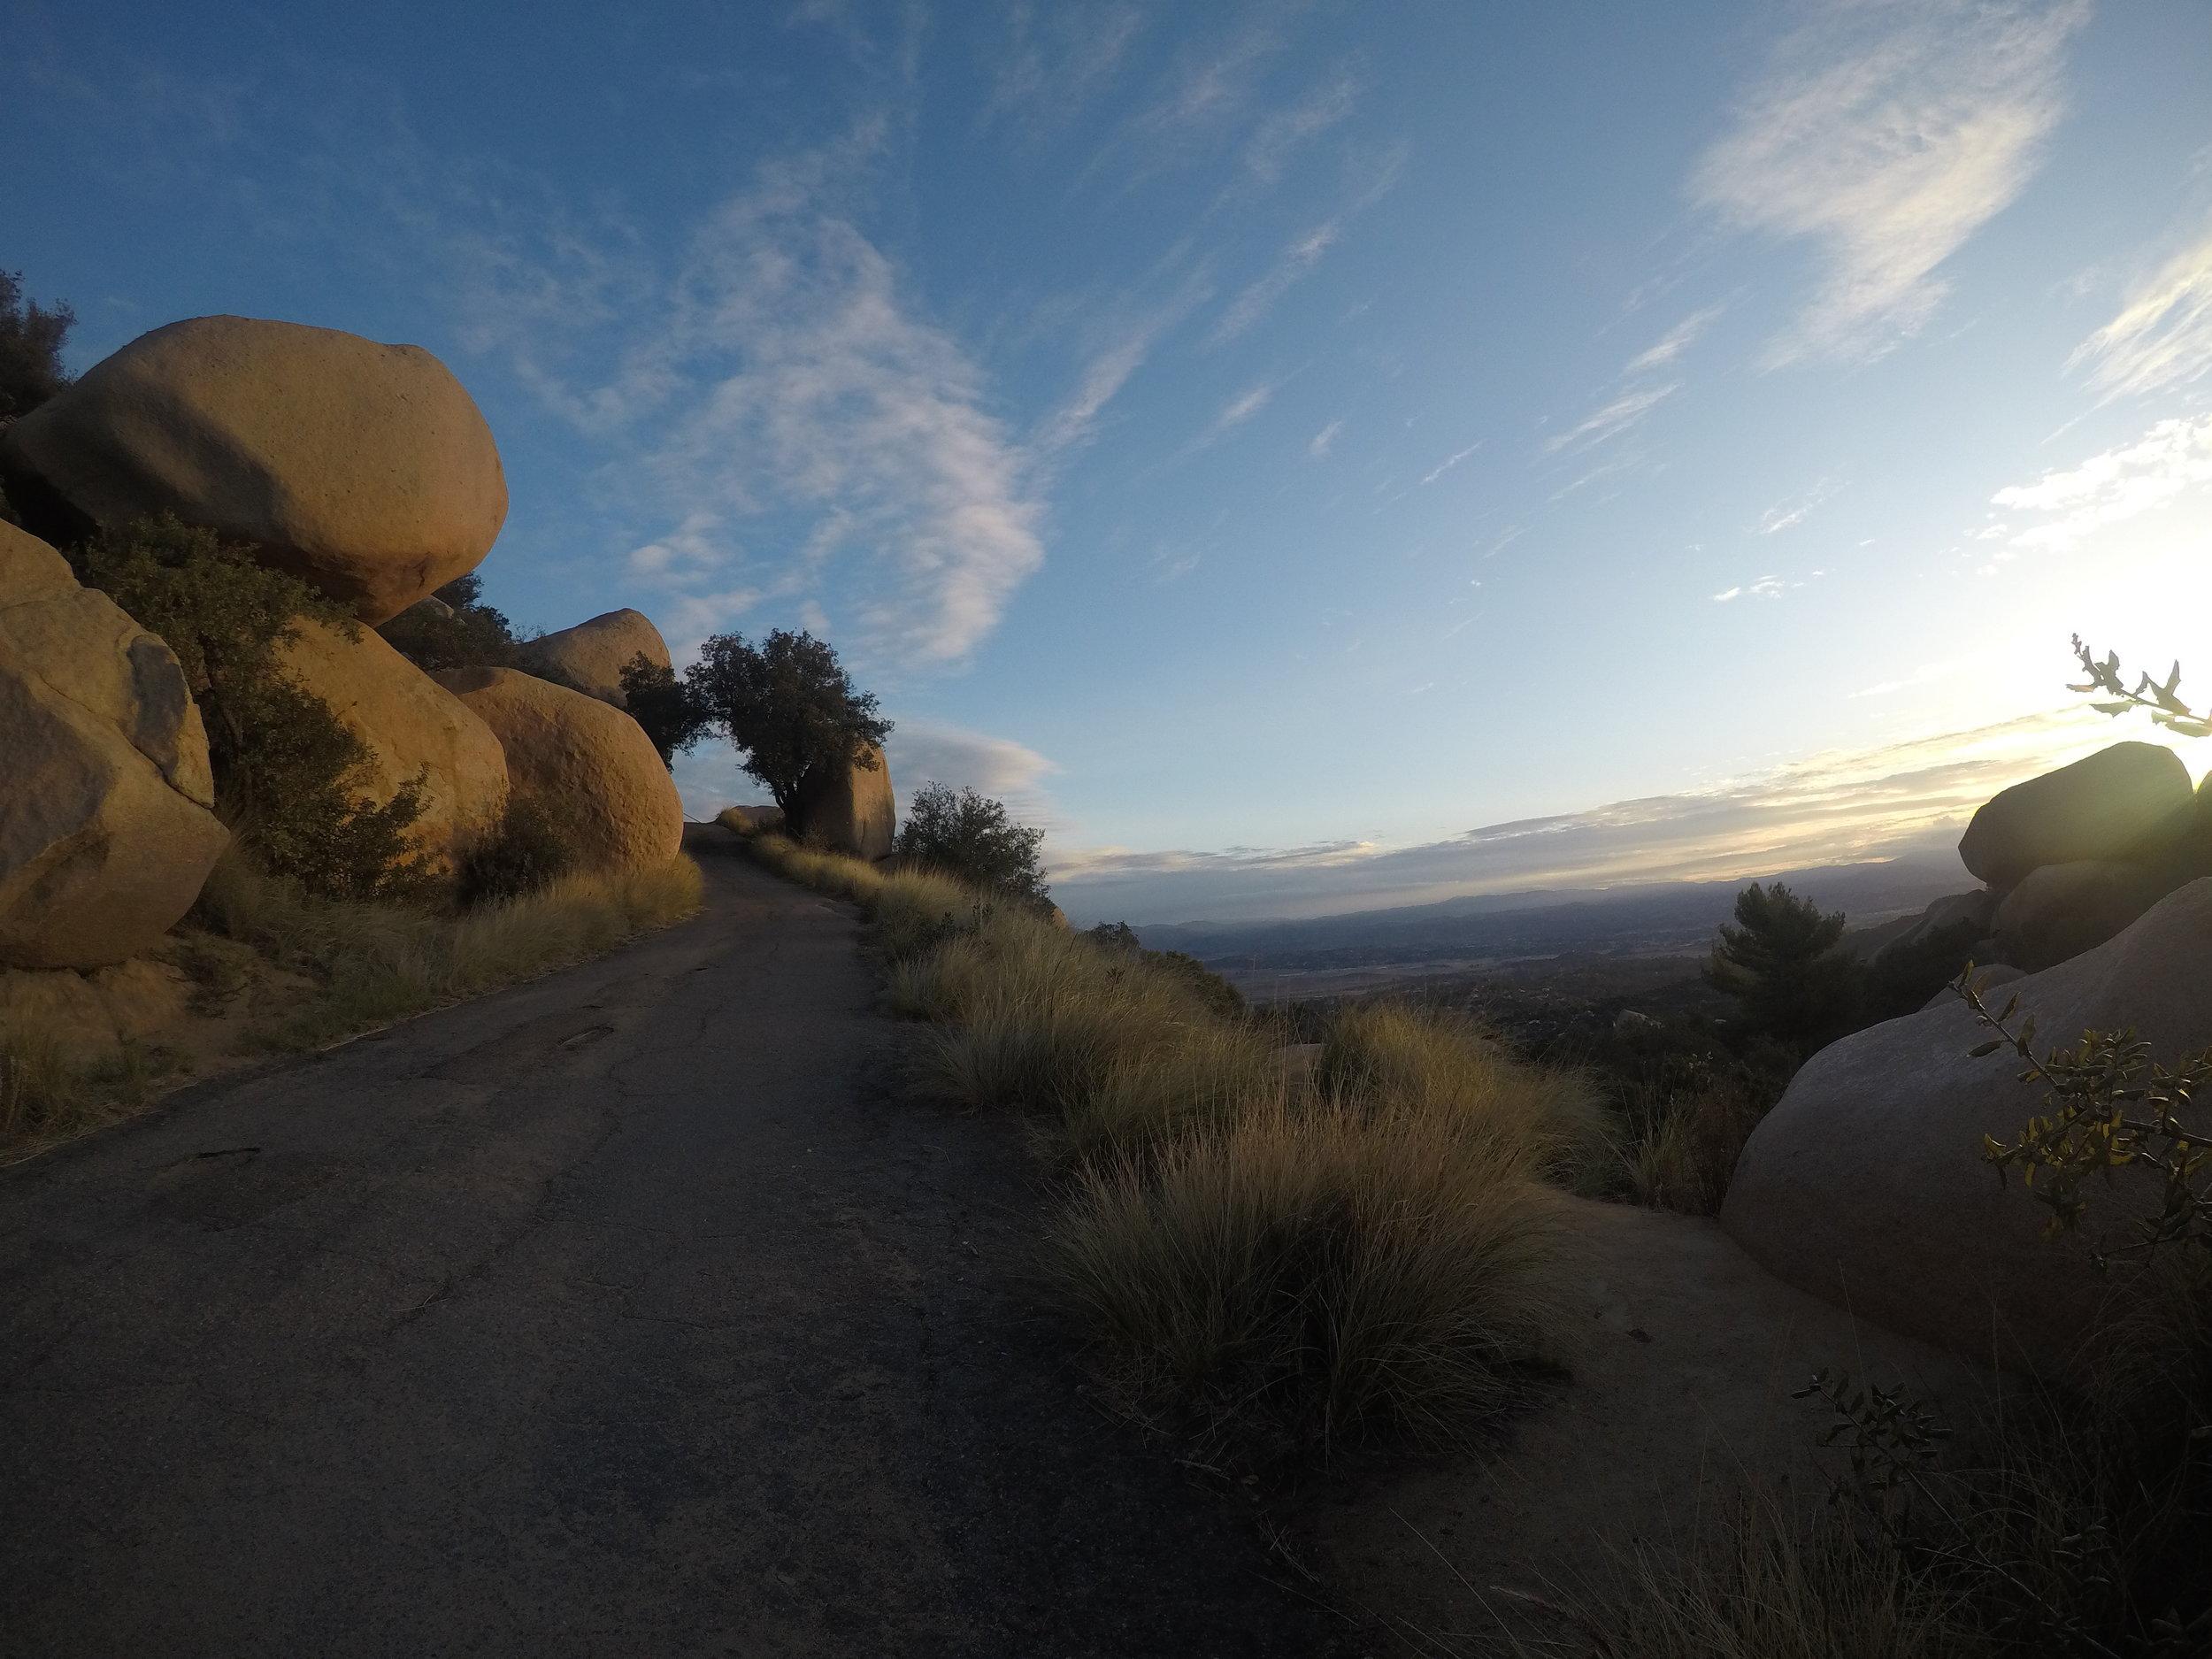 Mount Woodson has plenty of great rocks, including Potato Chip Rock to climb upon.